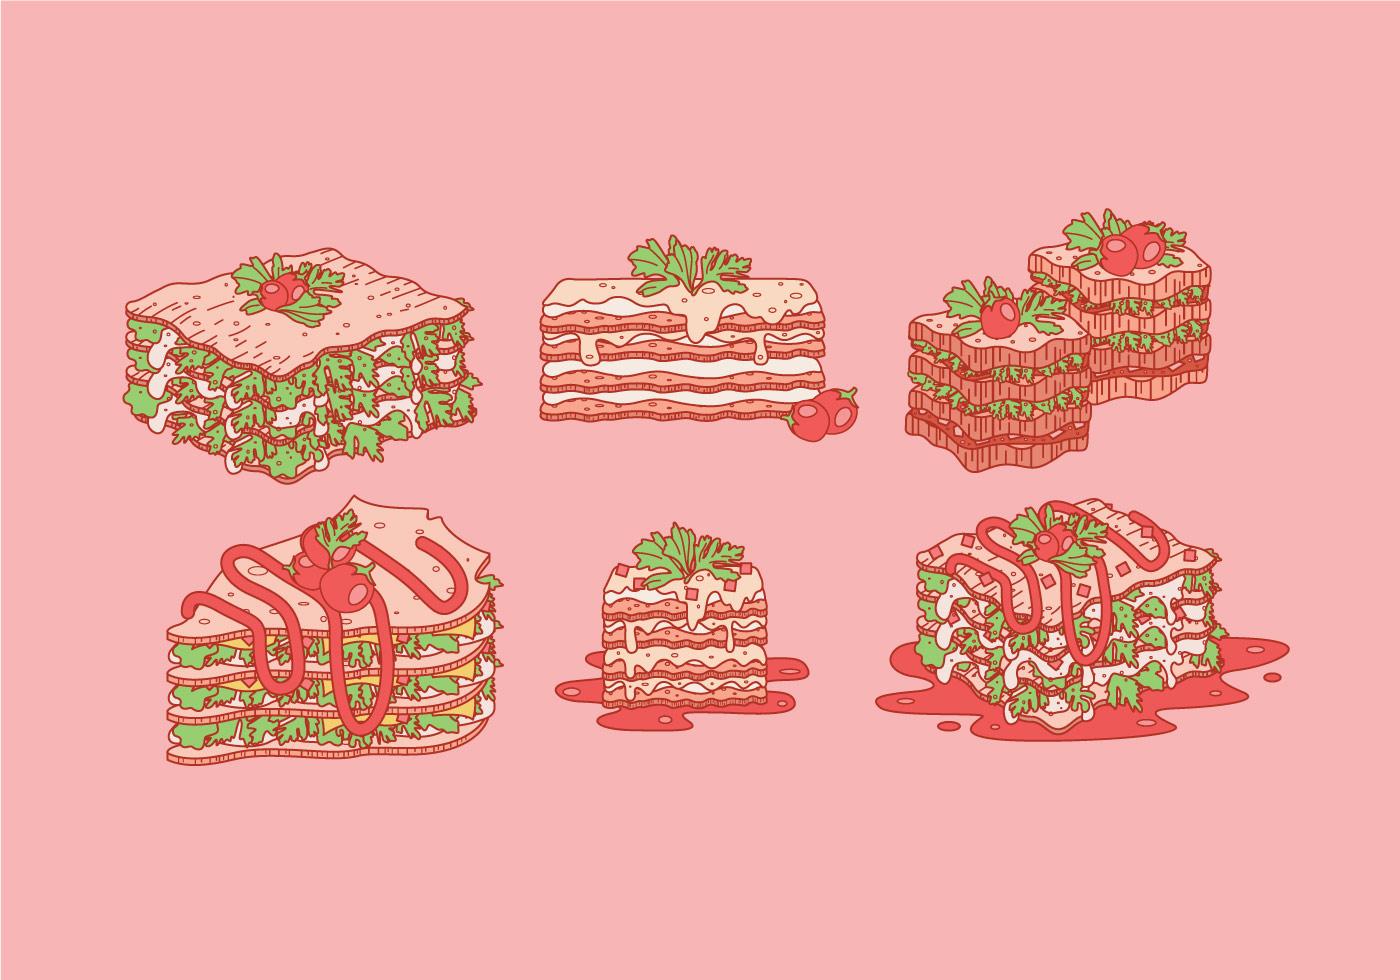 Lasagna Free Vector Art - (1313 Free Downloads)